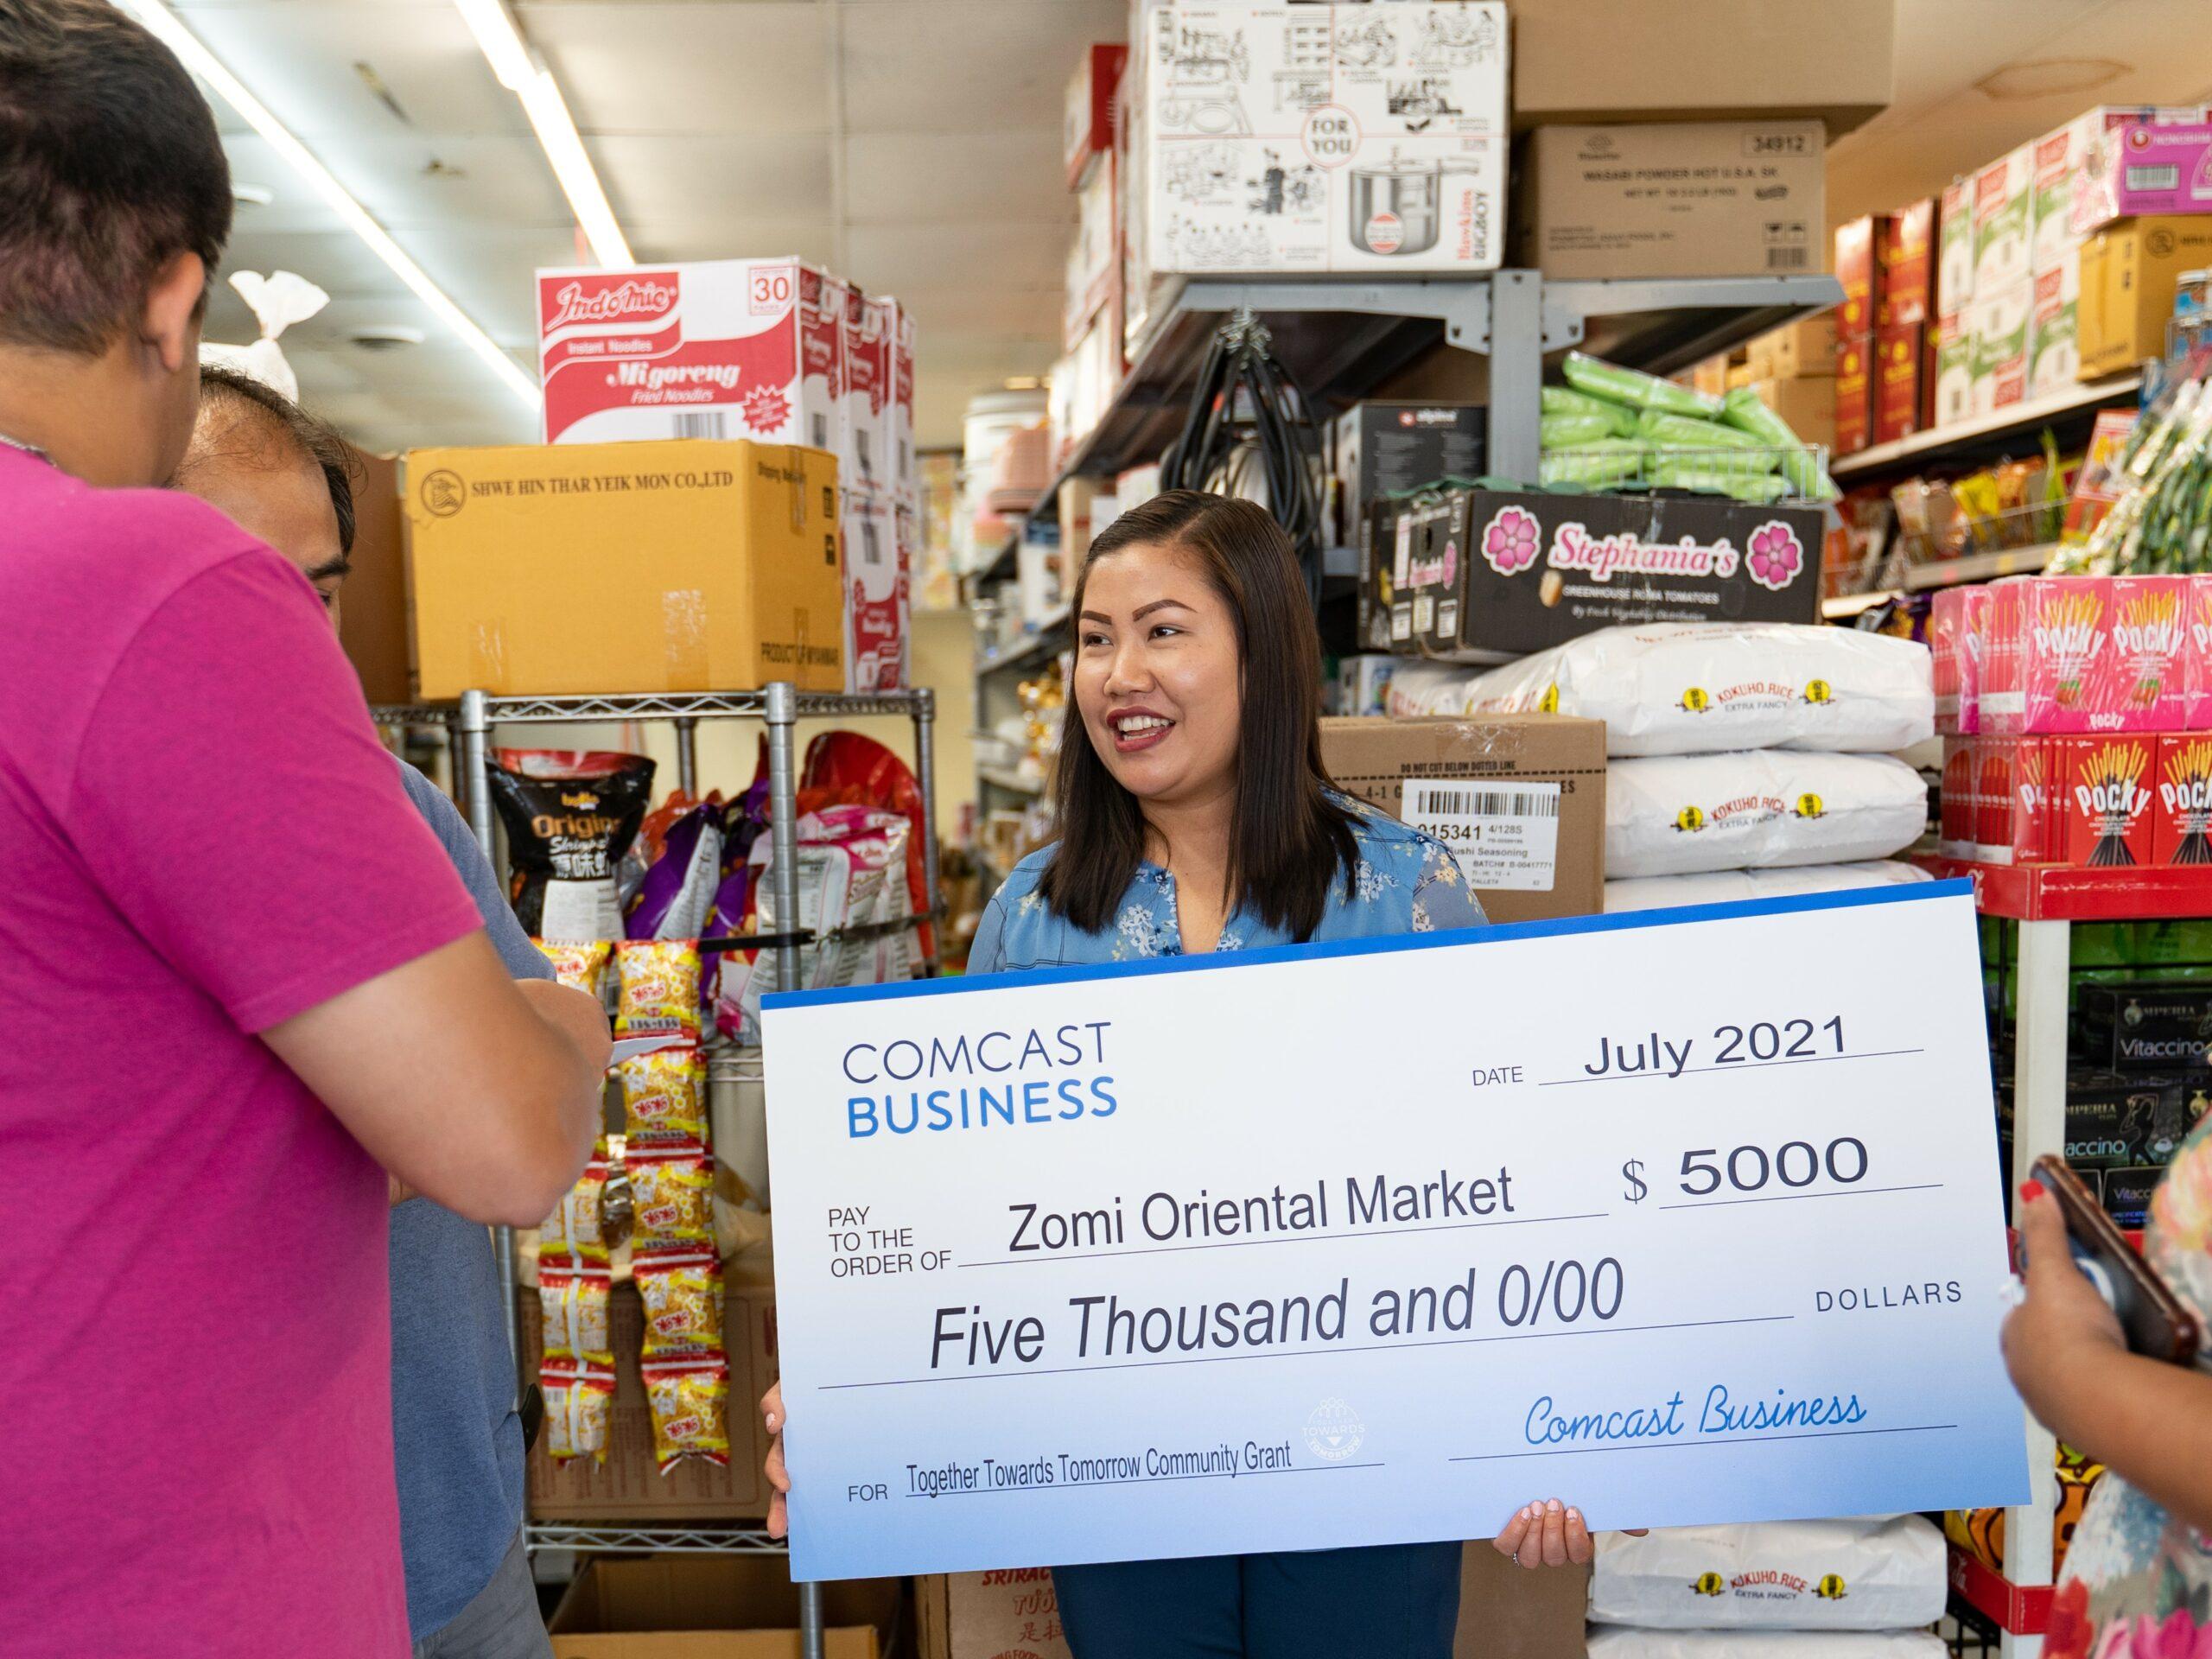 Comcast Business Awards $5,000 Grant to Zomi Oriental Market